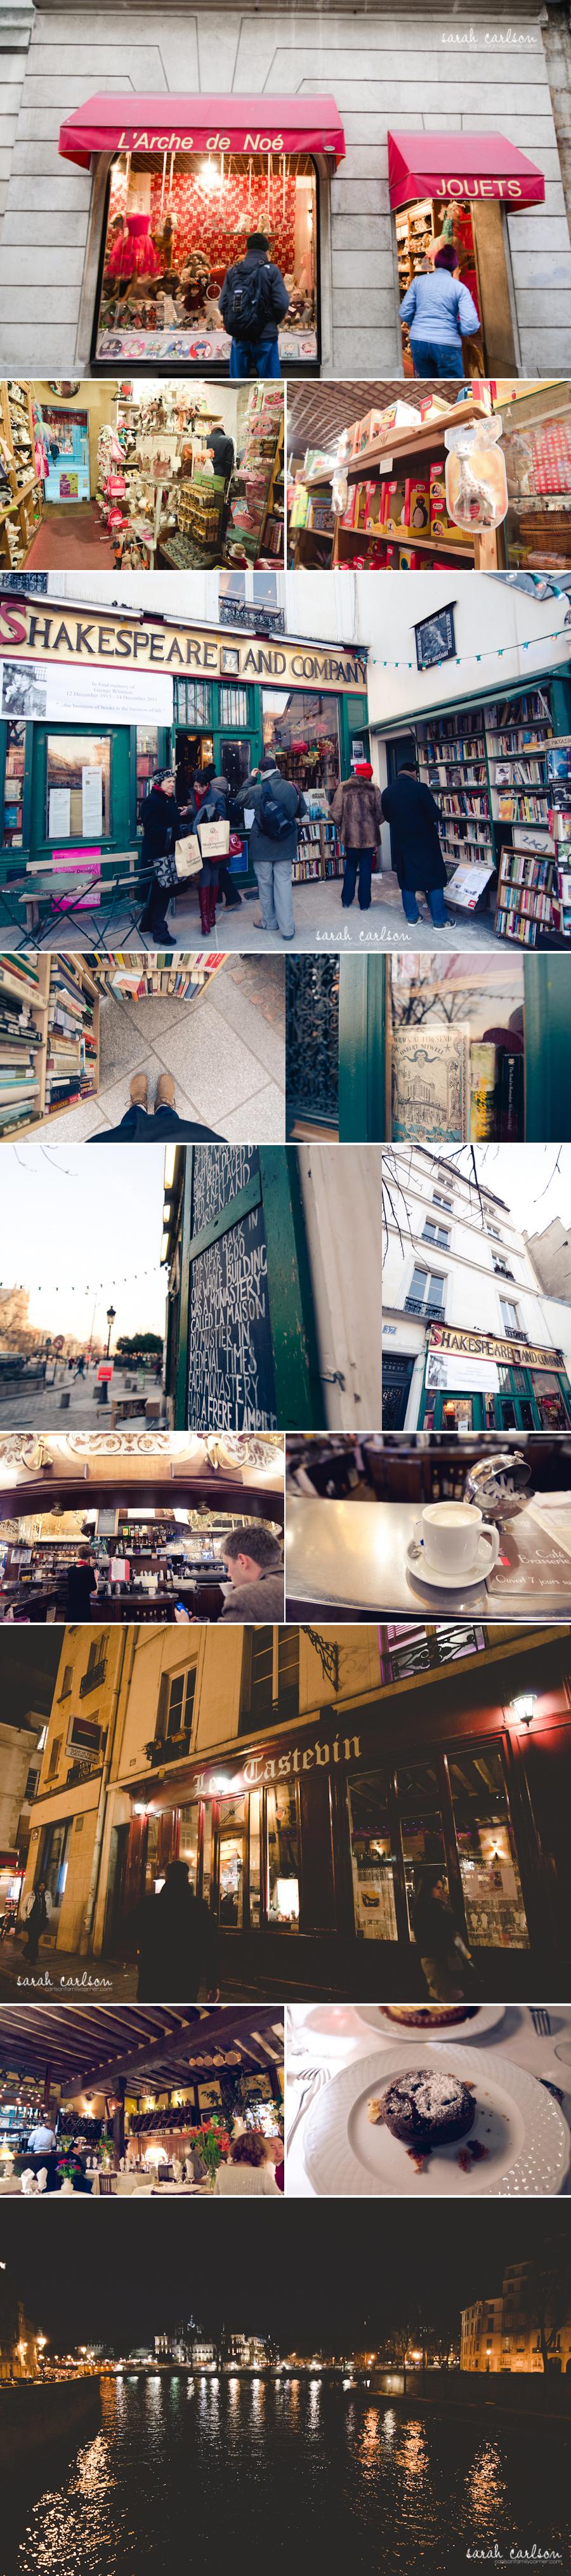 paris-day-2-strybd-4